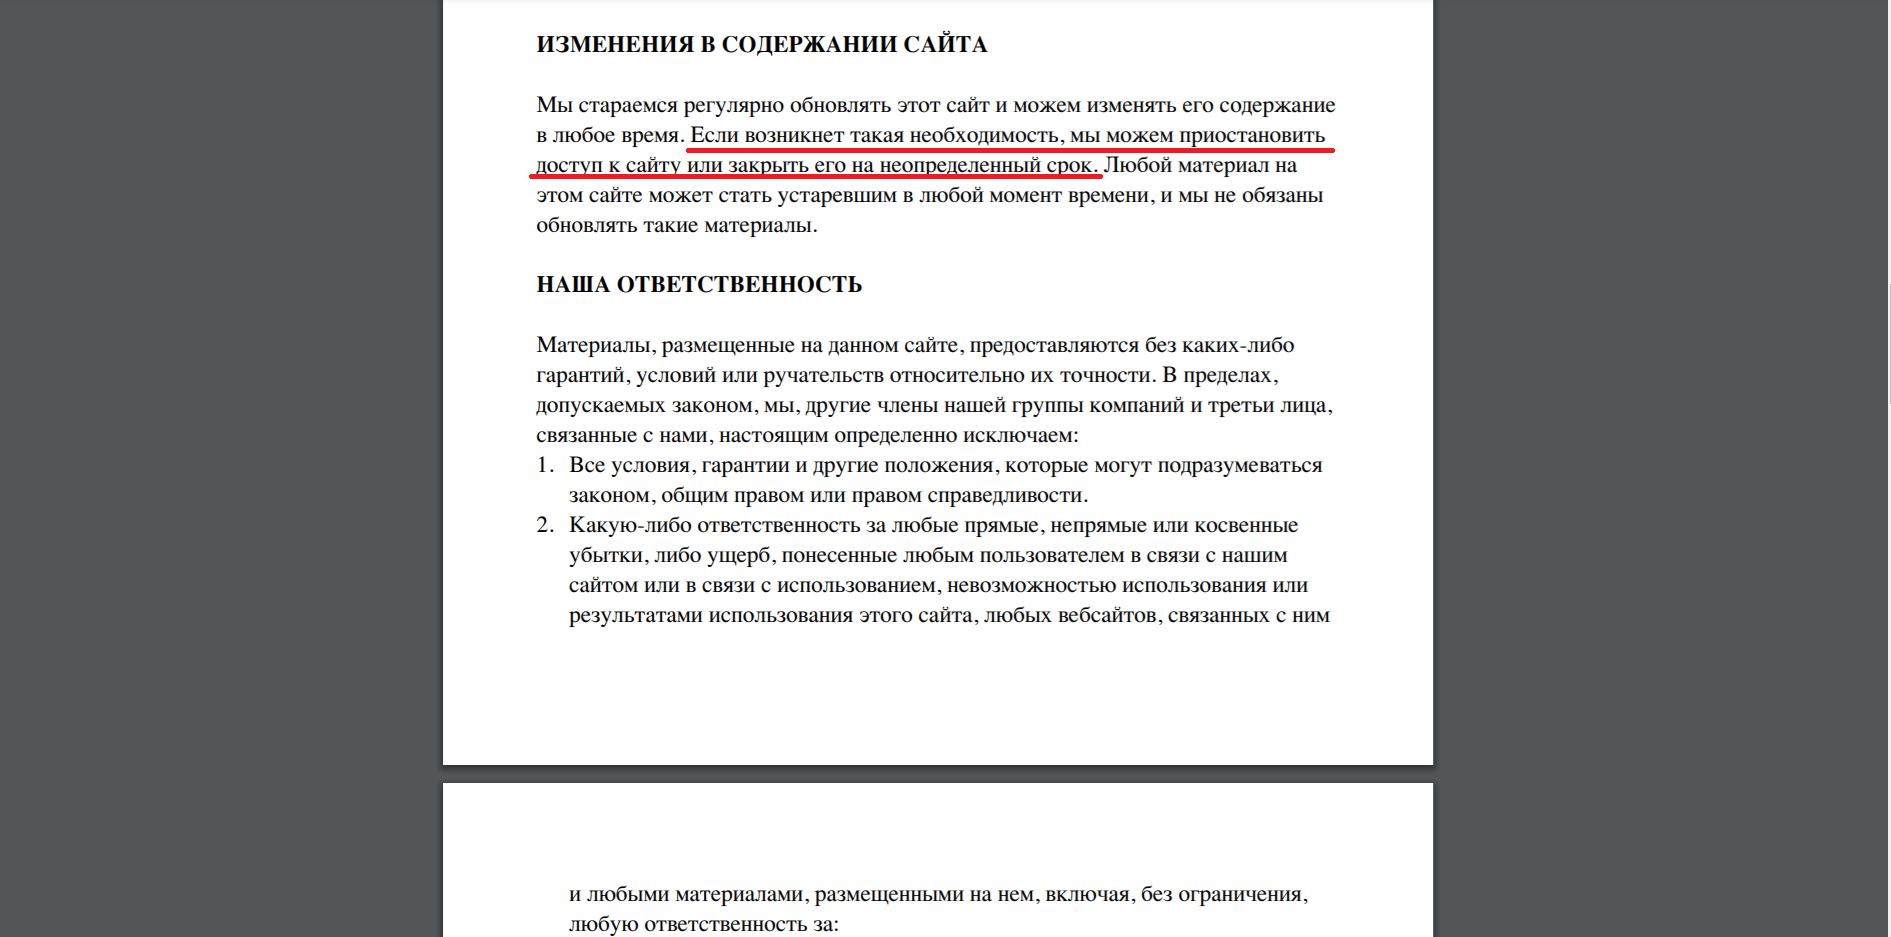 Cryptounit - Мошенники